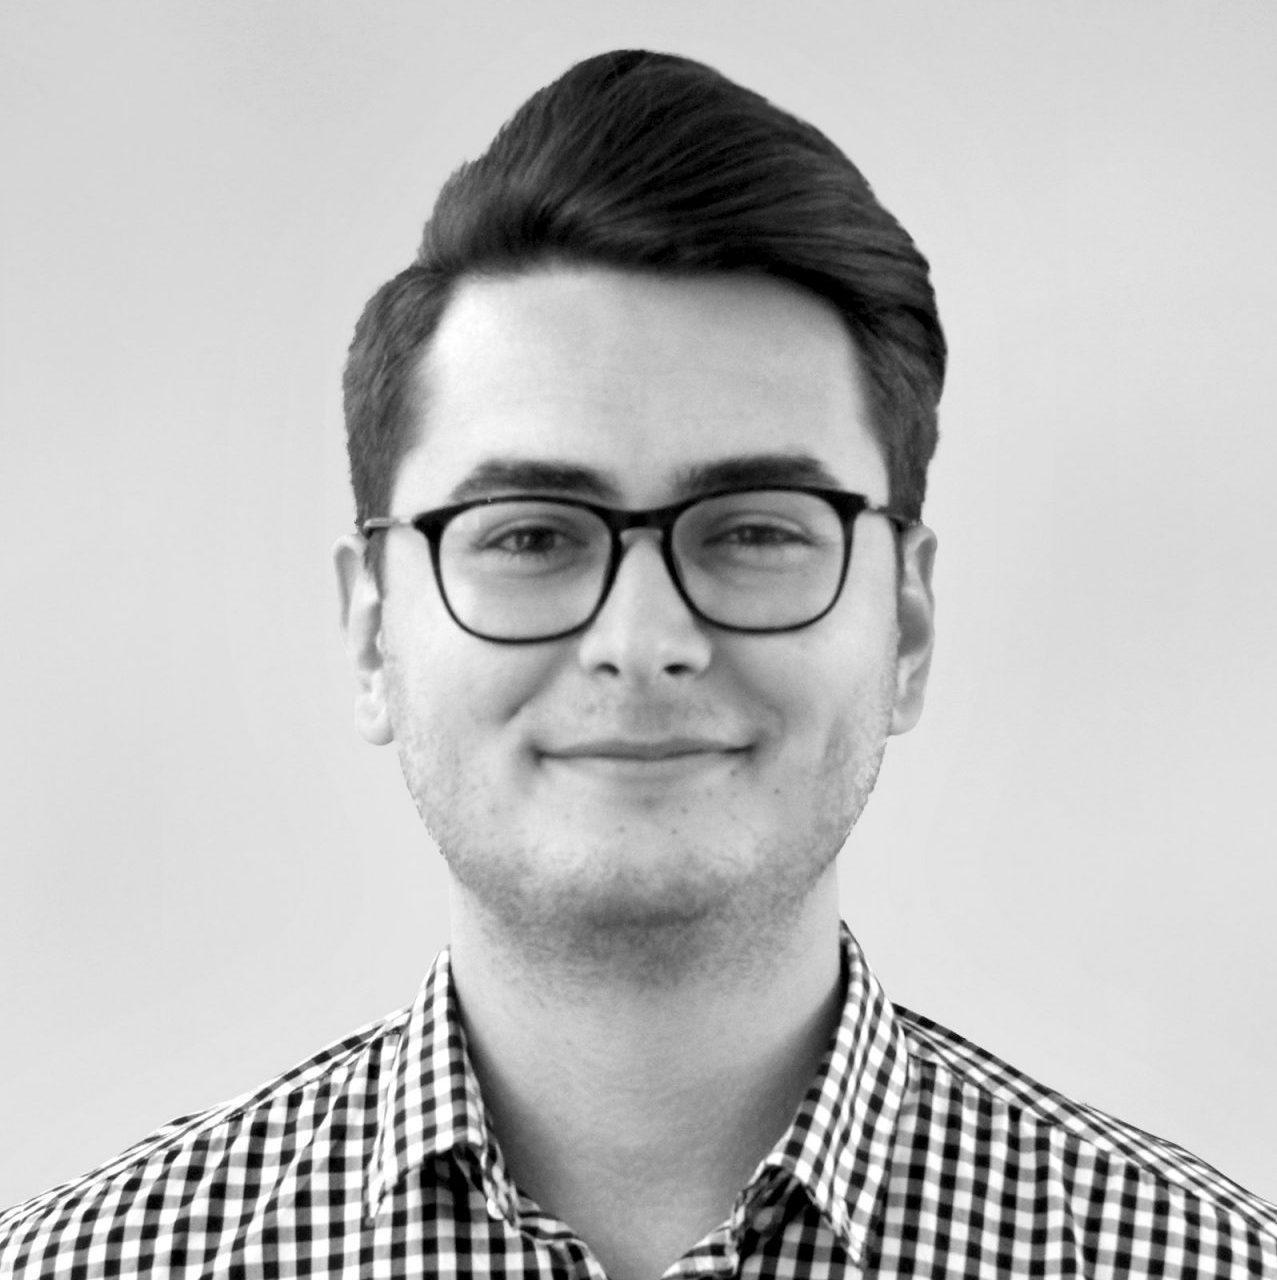 https://ksrarchitects.com/wp-content/uploads/2021/06/Cosmin-Lighter-Background-scaled-e1623325060641.jpg